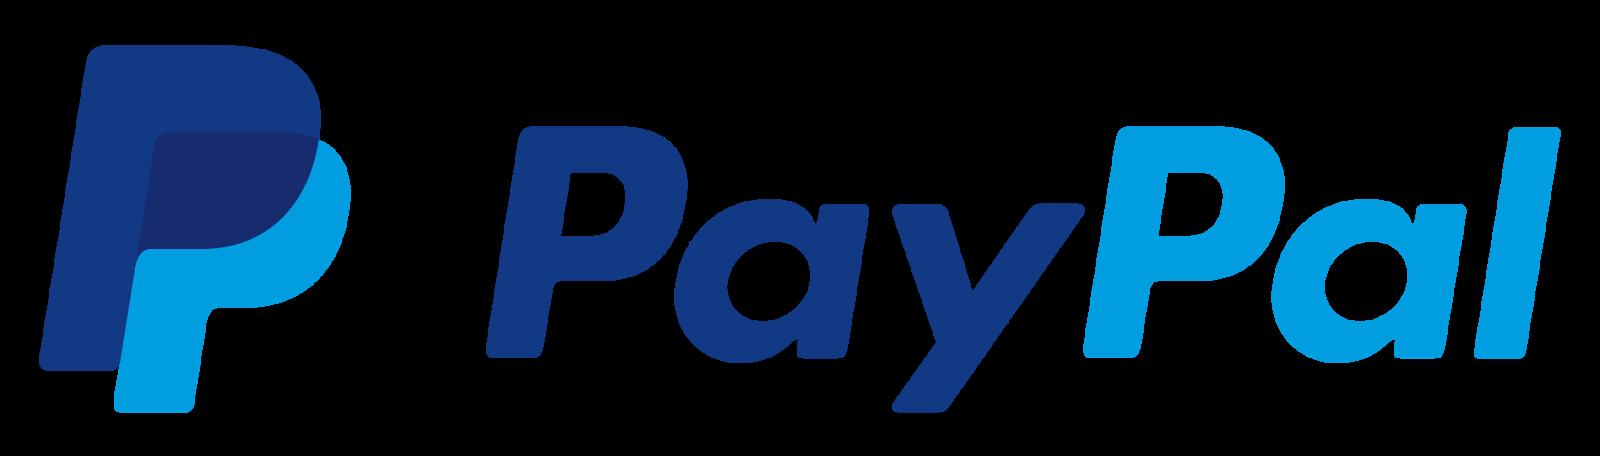 Paypal Logo transparent PNG - StickPNG